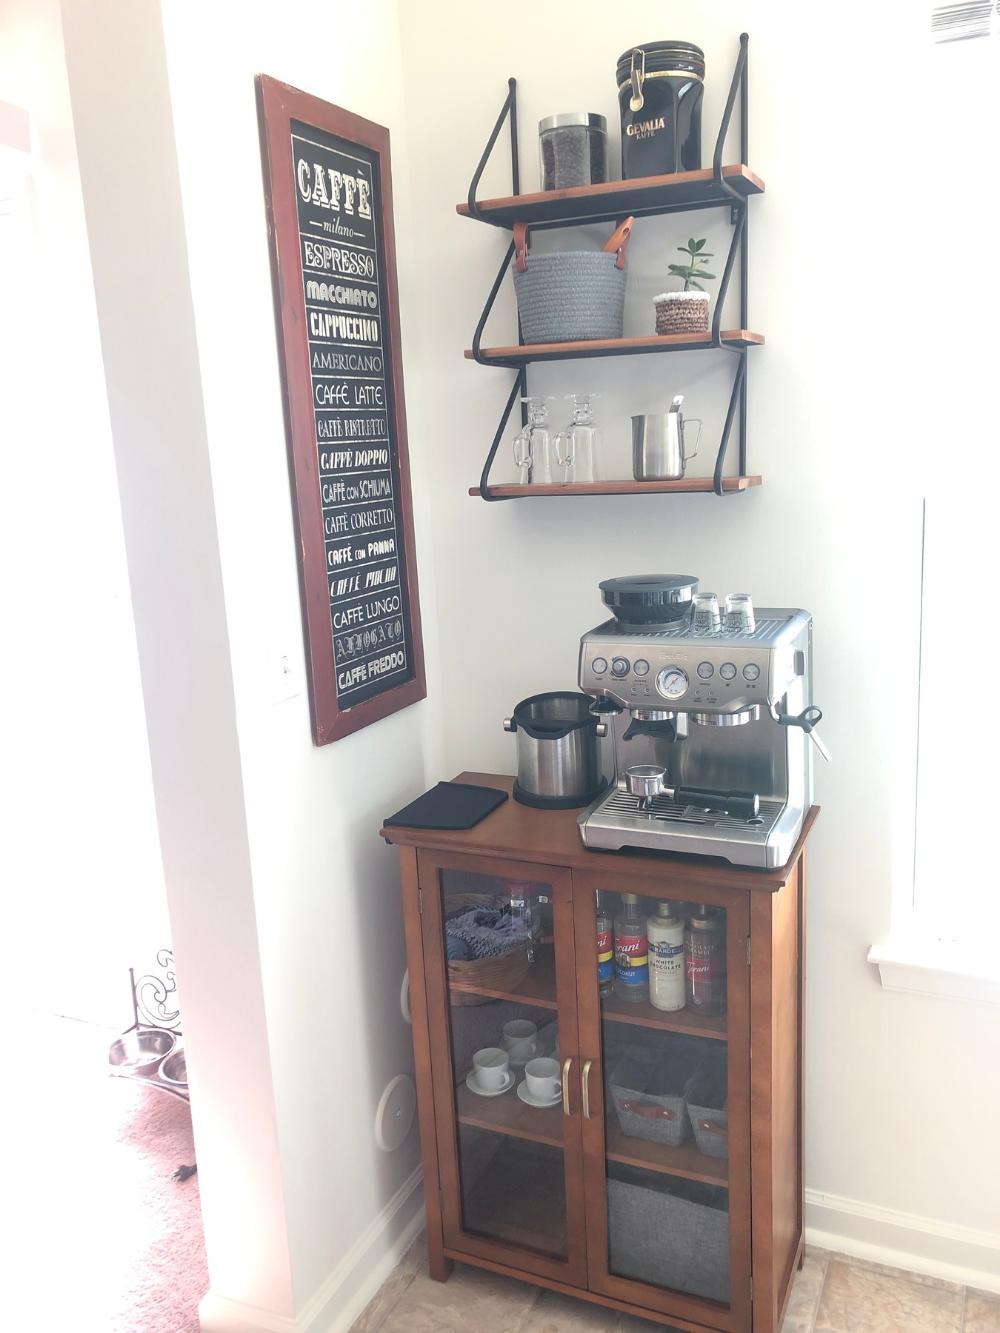 Breville Barista Express Espresso Machine Sur La Table Coffee Bar Home Home Coffee Stations Coffee Bar [ 1333 x 1000 Pixel ]